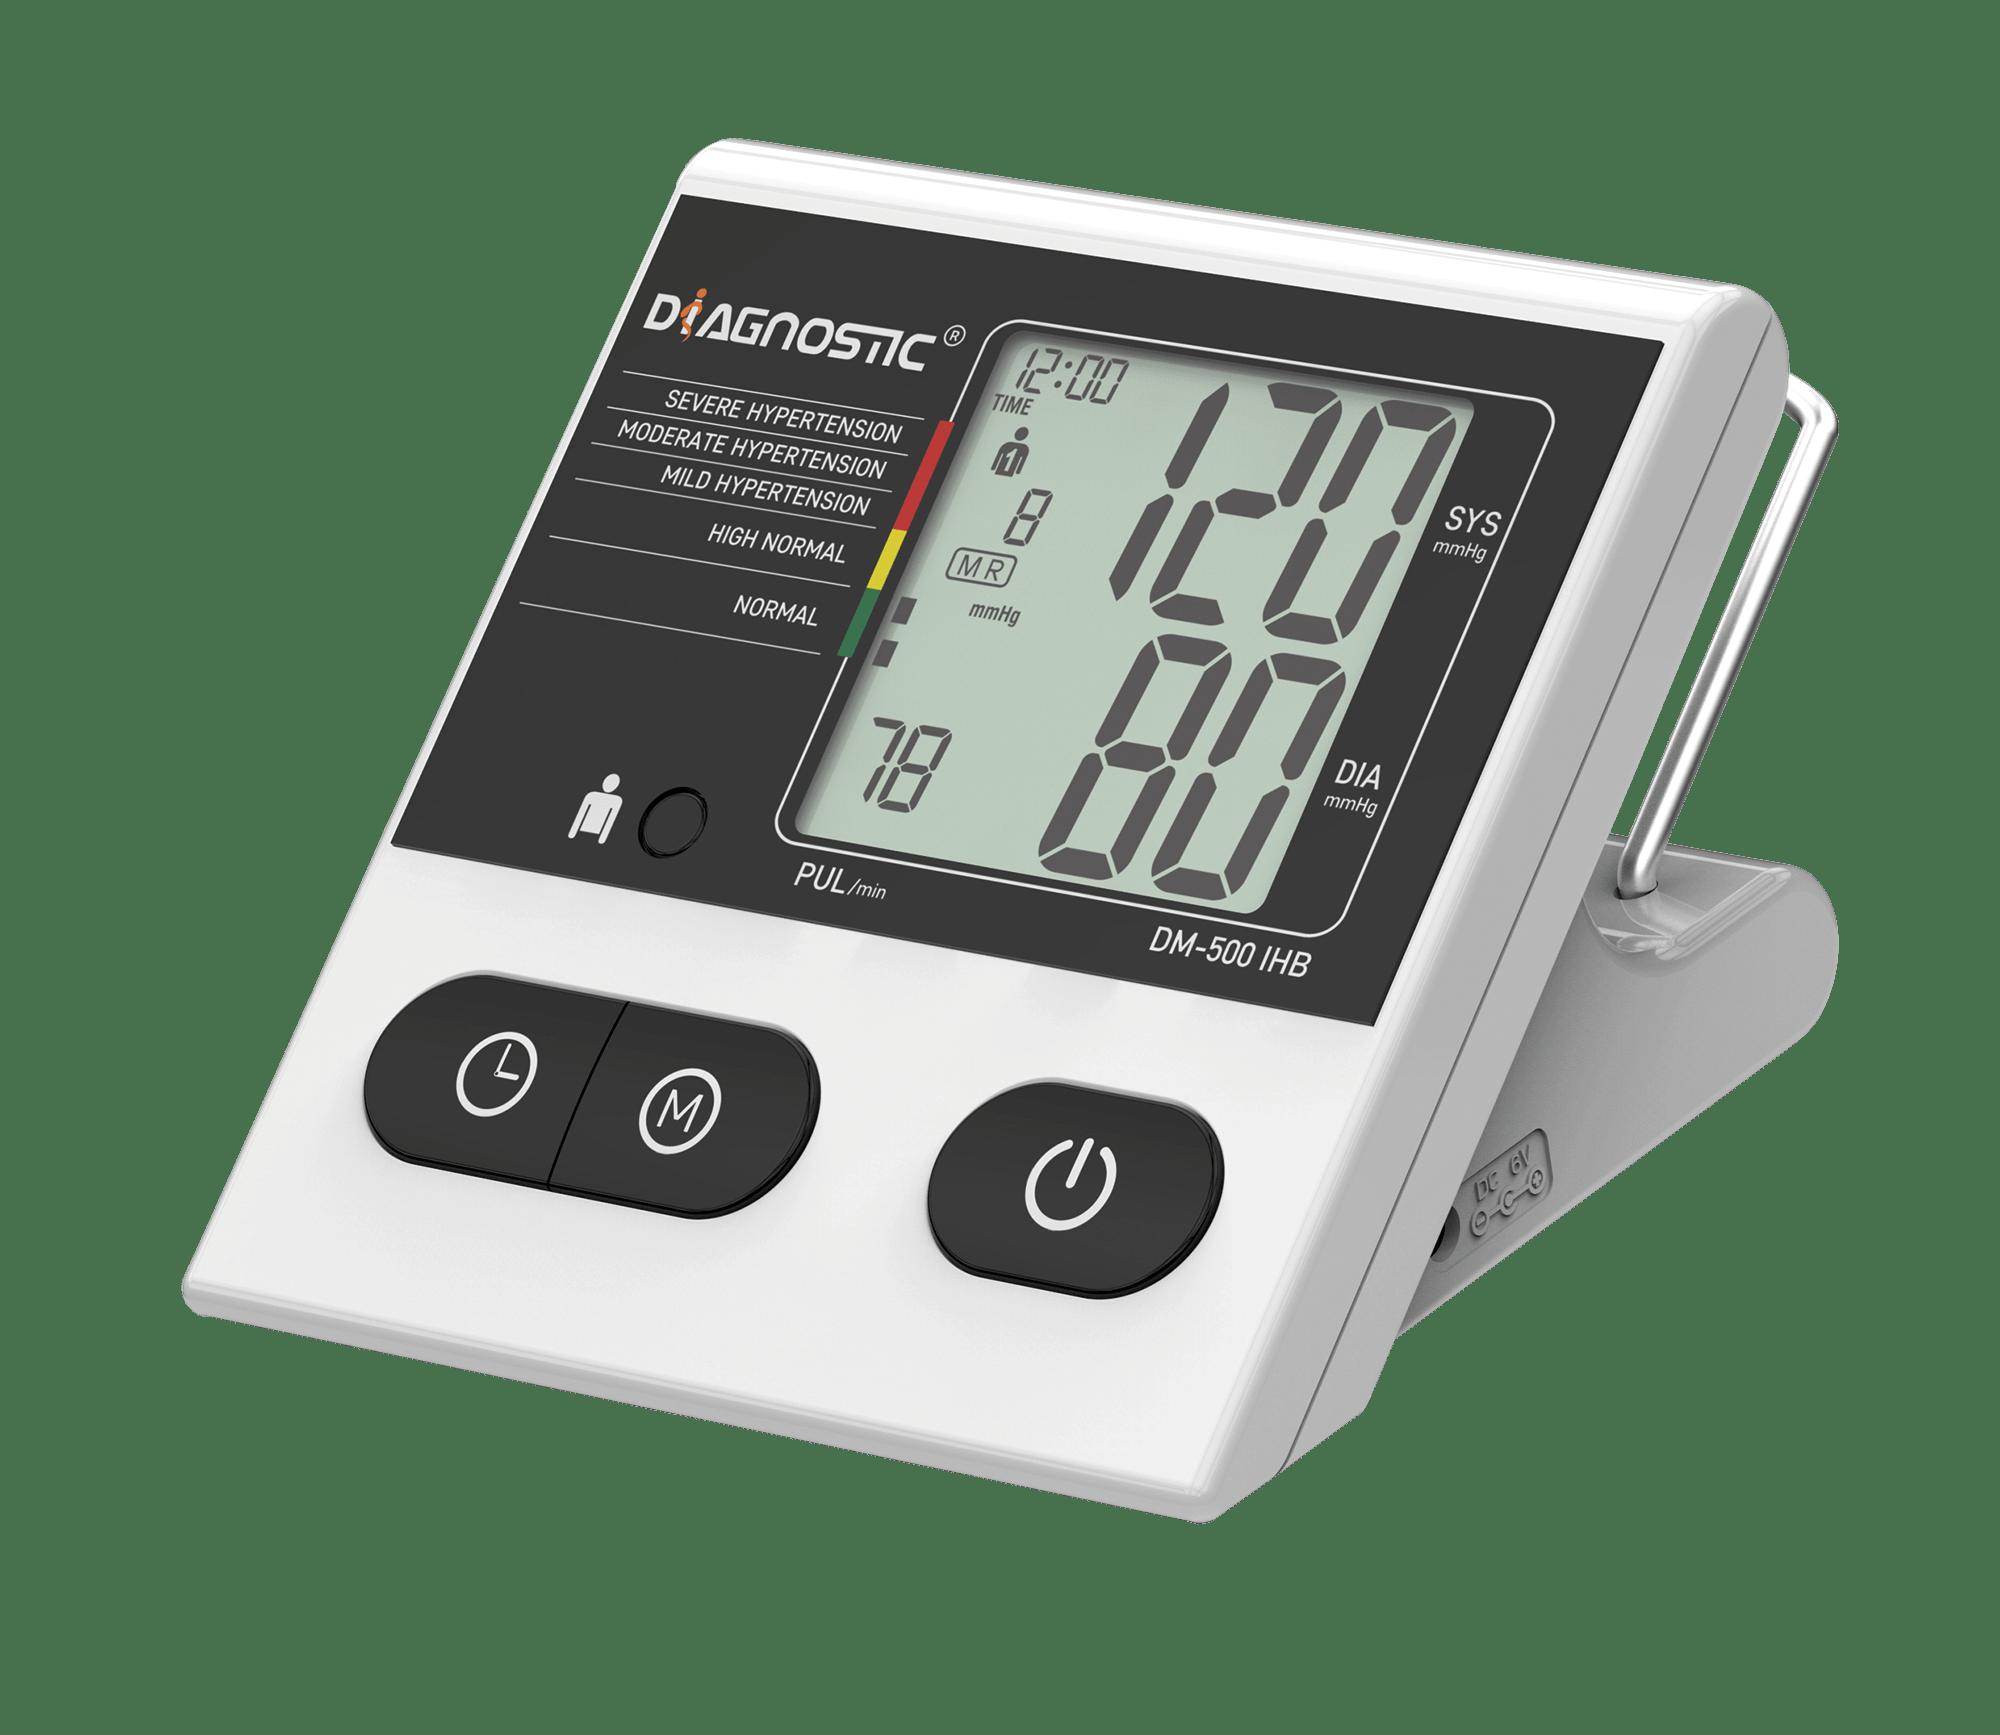 Ciśnieniomierz Diagnostic DM-500 IHB